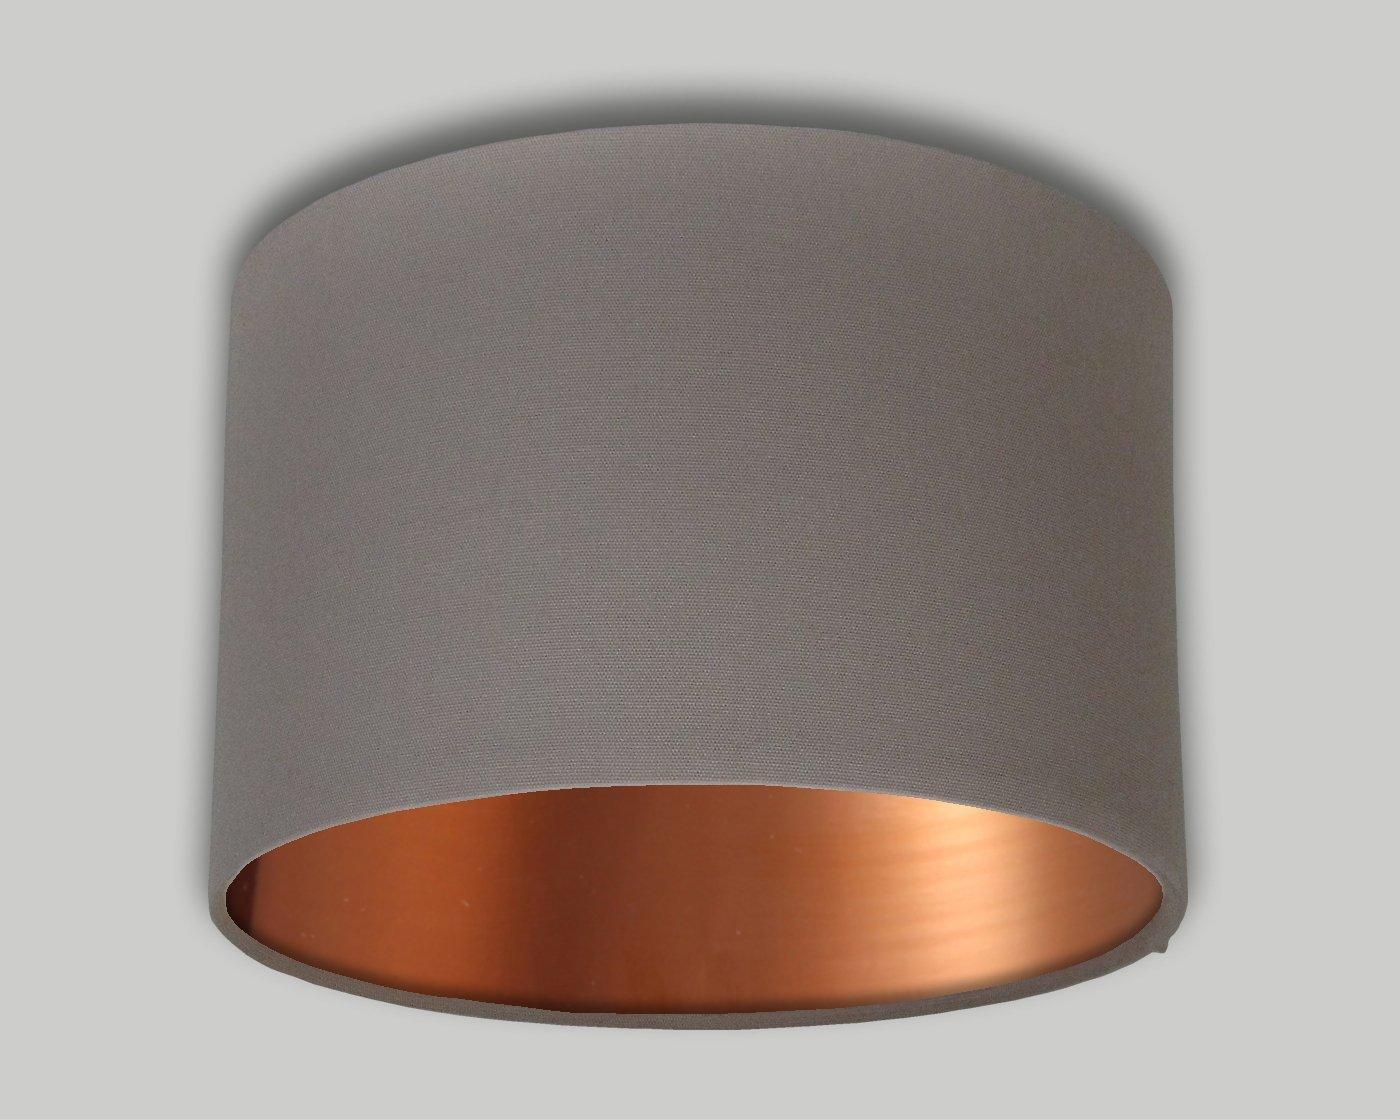 Dark Beige Drum Lampshade Brushed Copper Inner 20cm 25cm 30cm 35cm 40cm 50cm 60cm 70cm Lamp Shade Lightshade